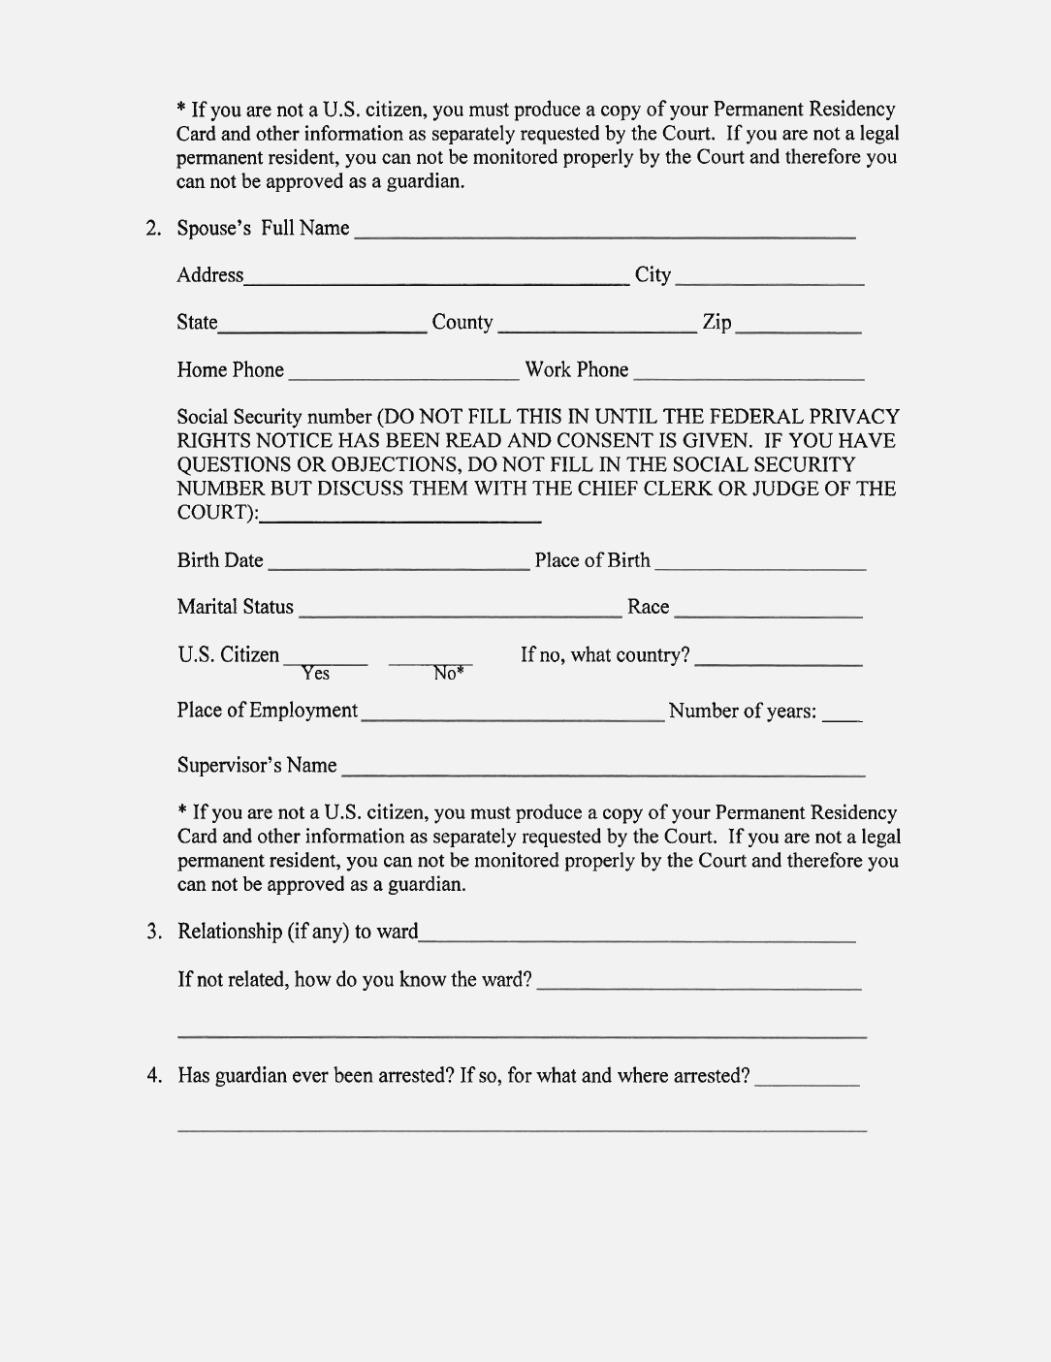 Free Printable Temporary Guardianship Form – Keni.candlecomfortzone - Free Printable Legal Guardianship Forms